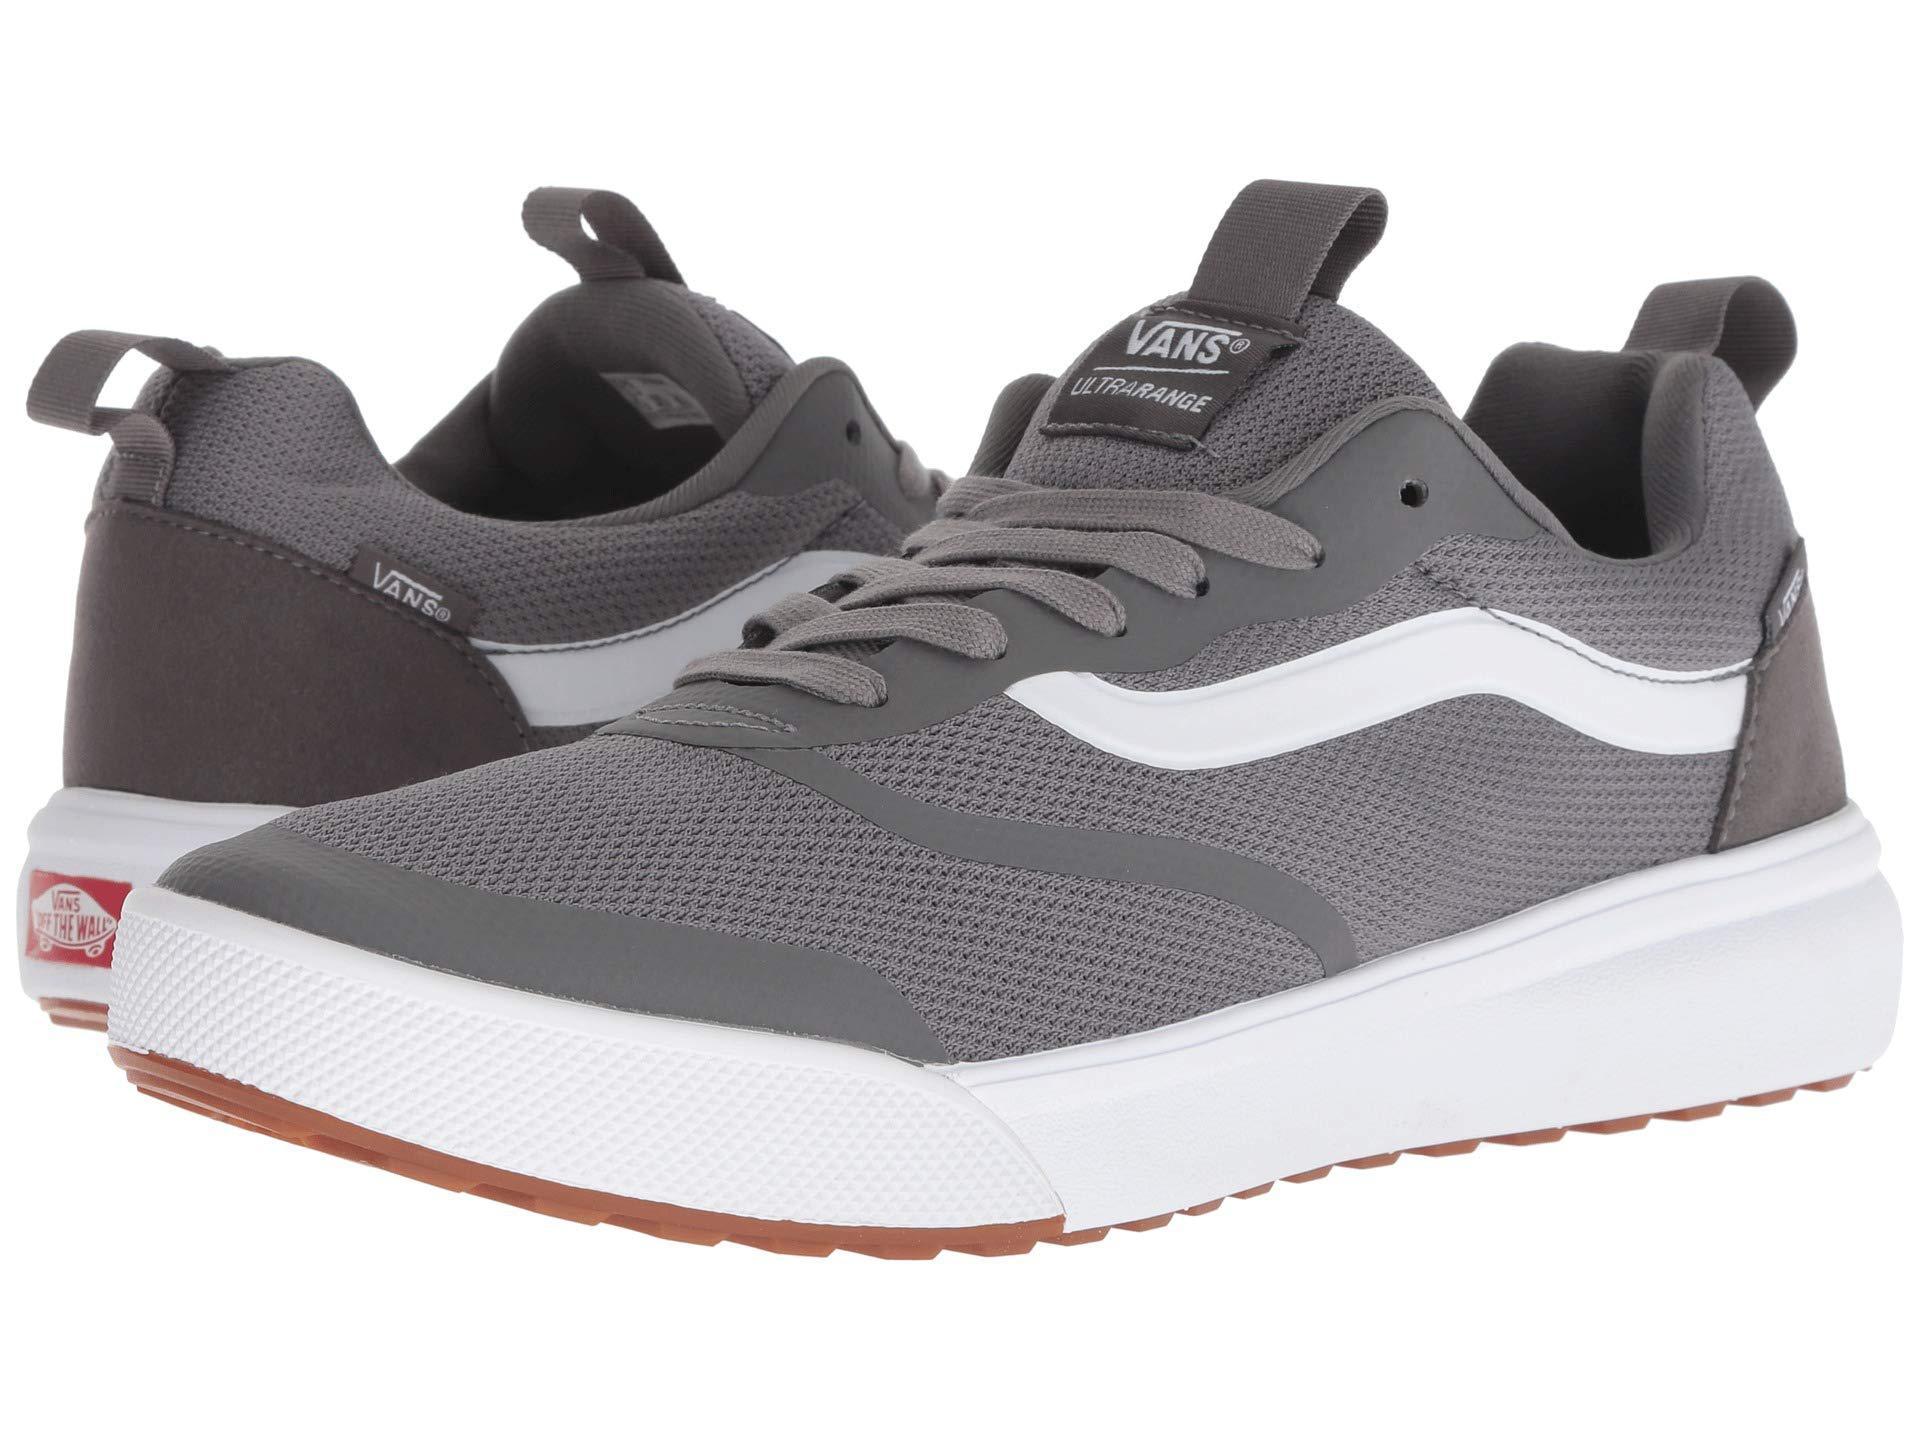 6d5fe6d16dcdd0 Lyst - Vans Ultrarange Rapidweld  18 (black black) Skate Shoes for Men